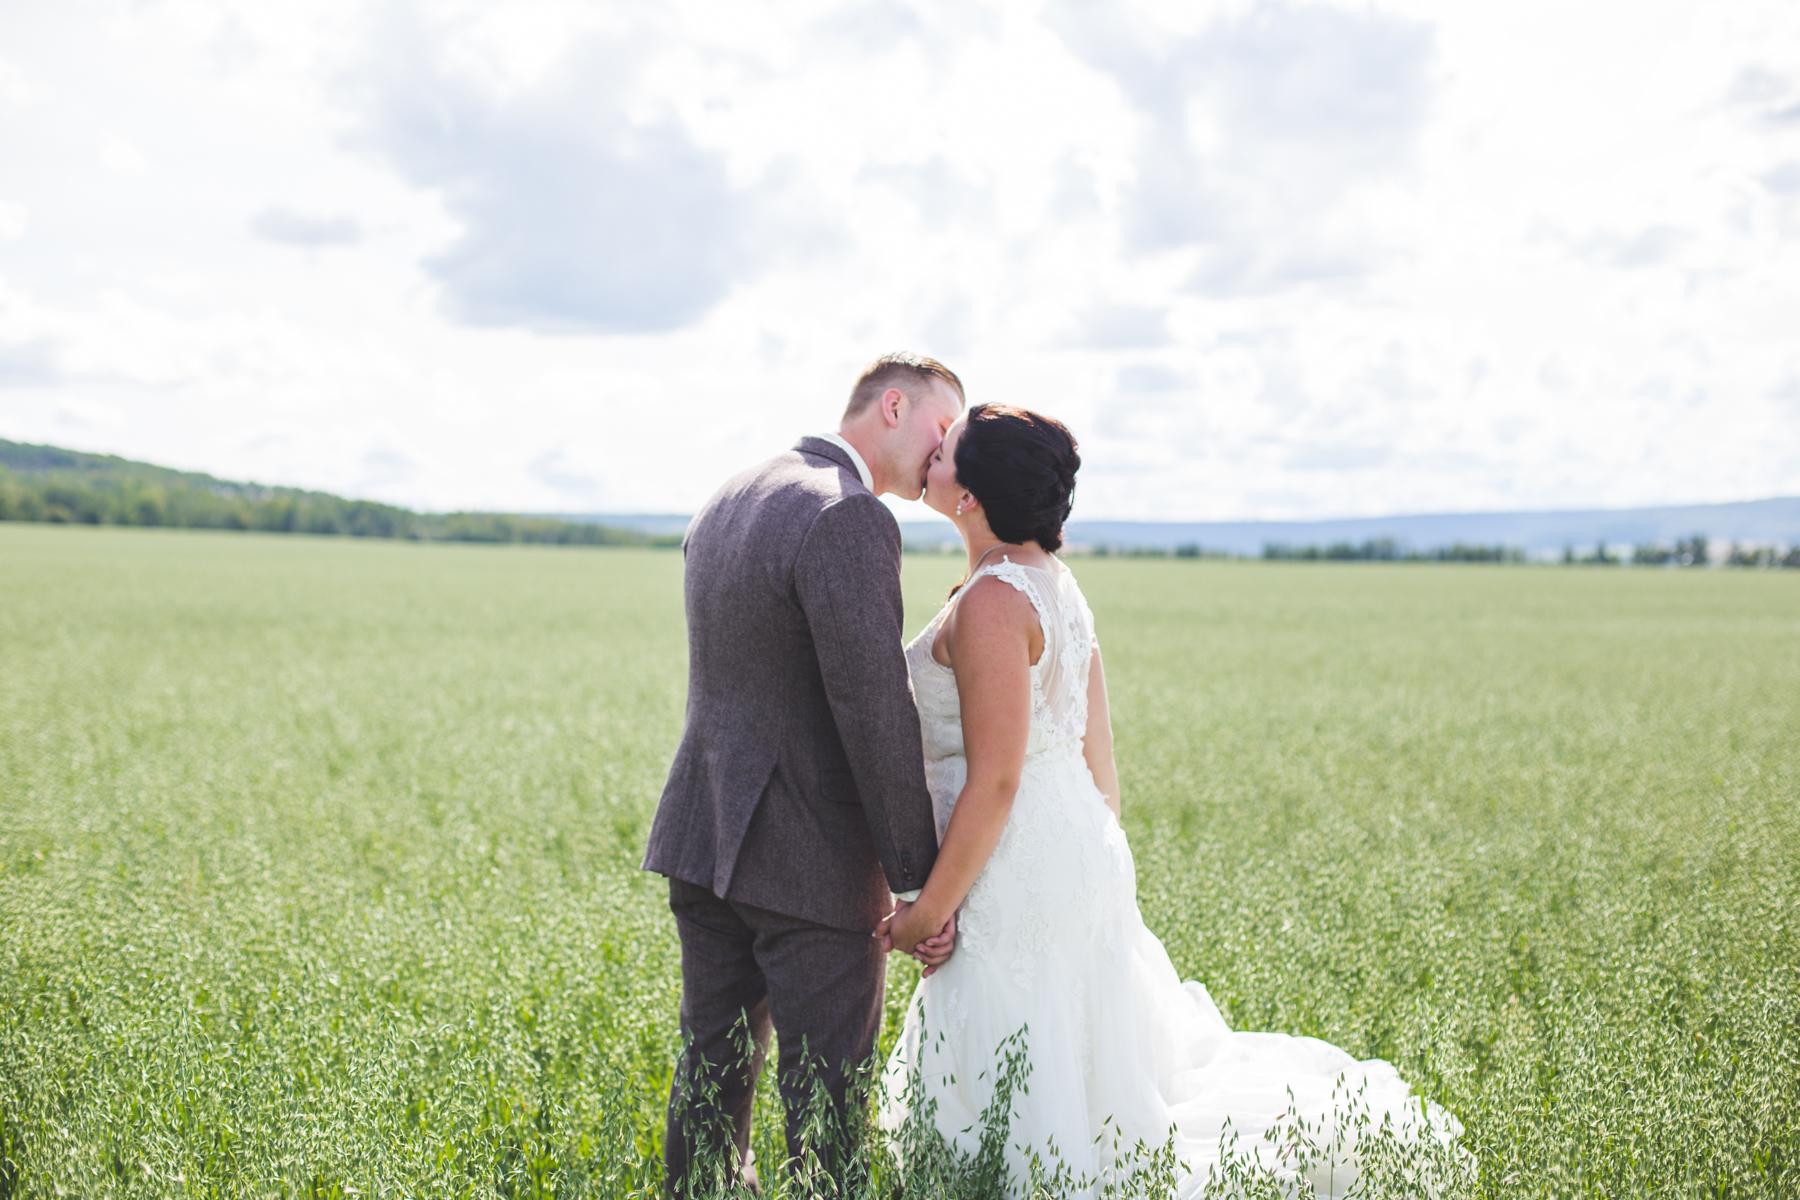 20150808-oglovewedding-1191.jpg